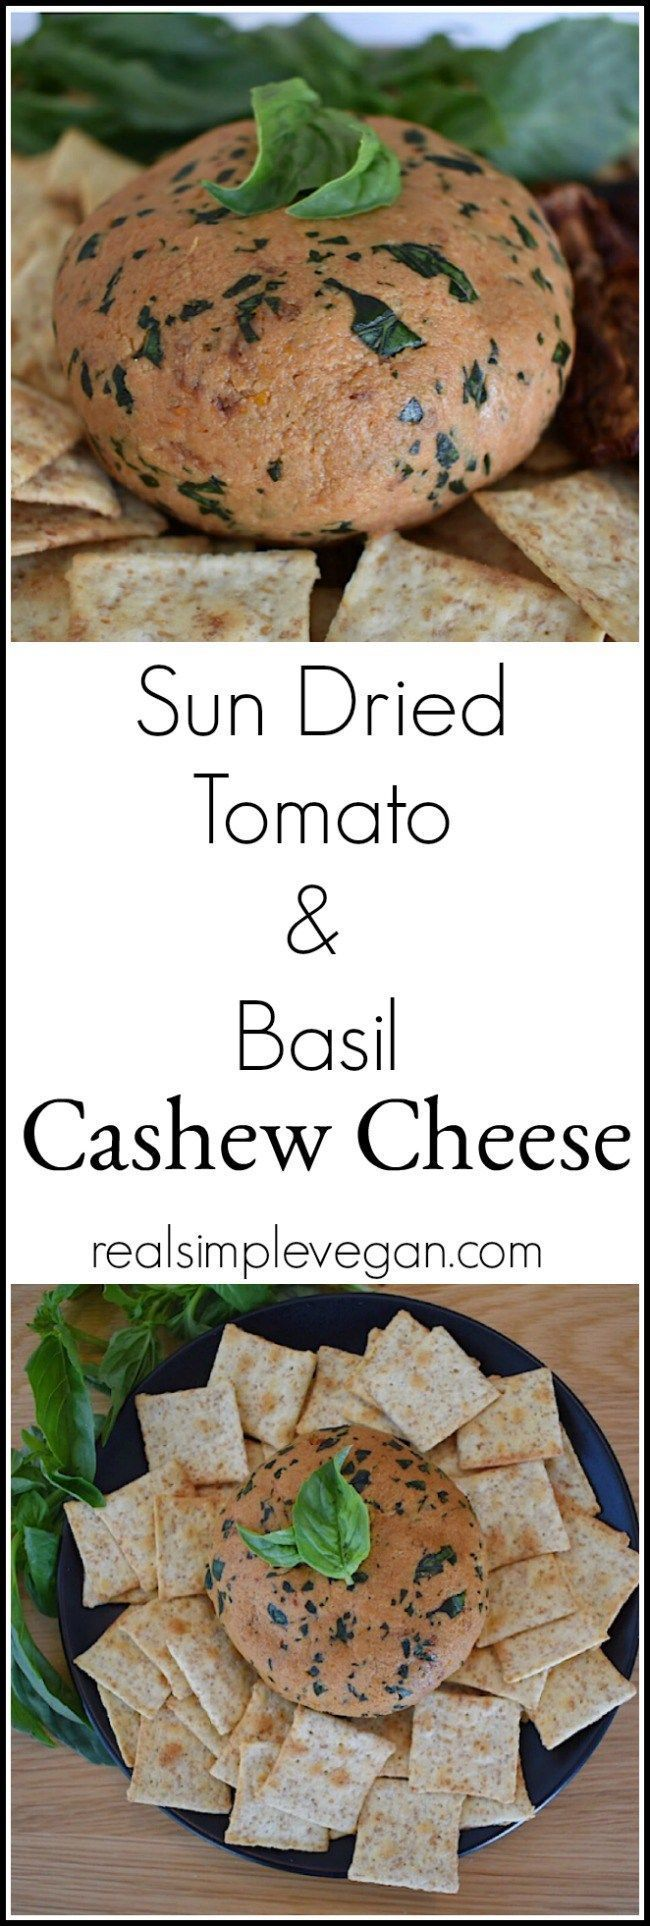 Vegan Sun Dried Tomato and Basil Cashew Cheese | Real. Simple. Vegan. (scheduled via http://www.tailwindapp.com?utm_source=pinterest&utm_medium=twpin)